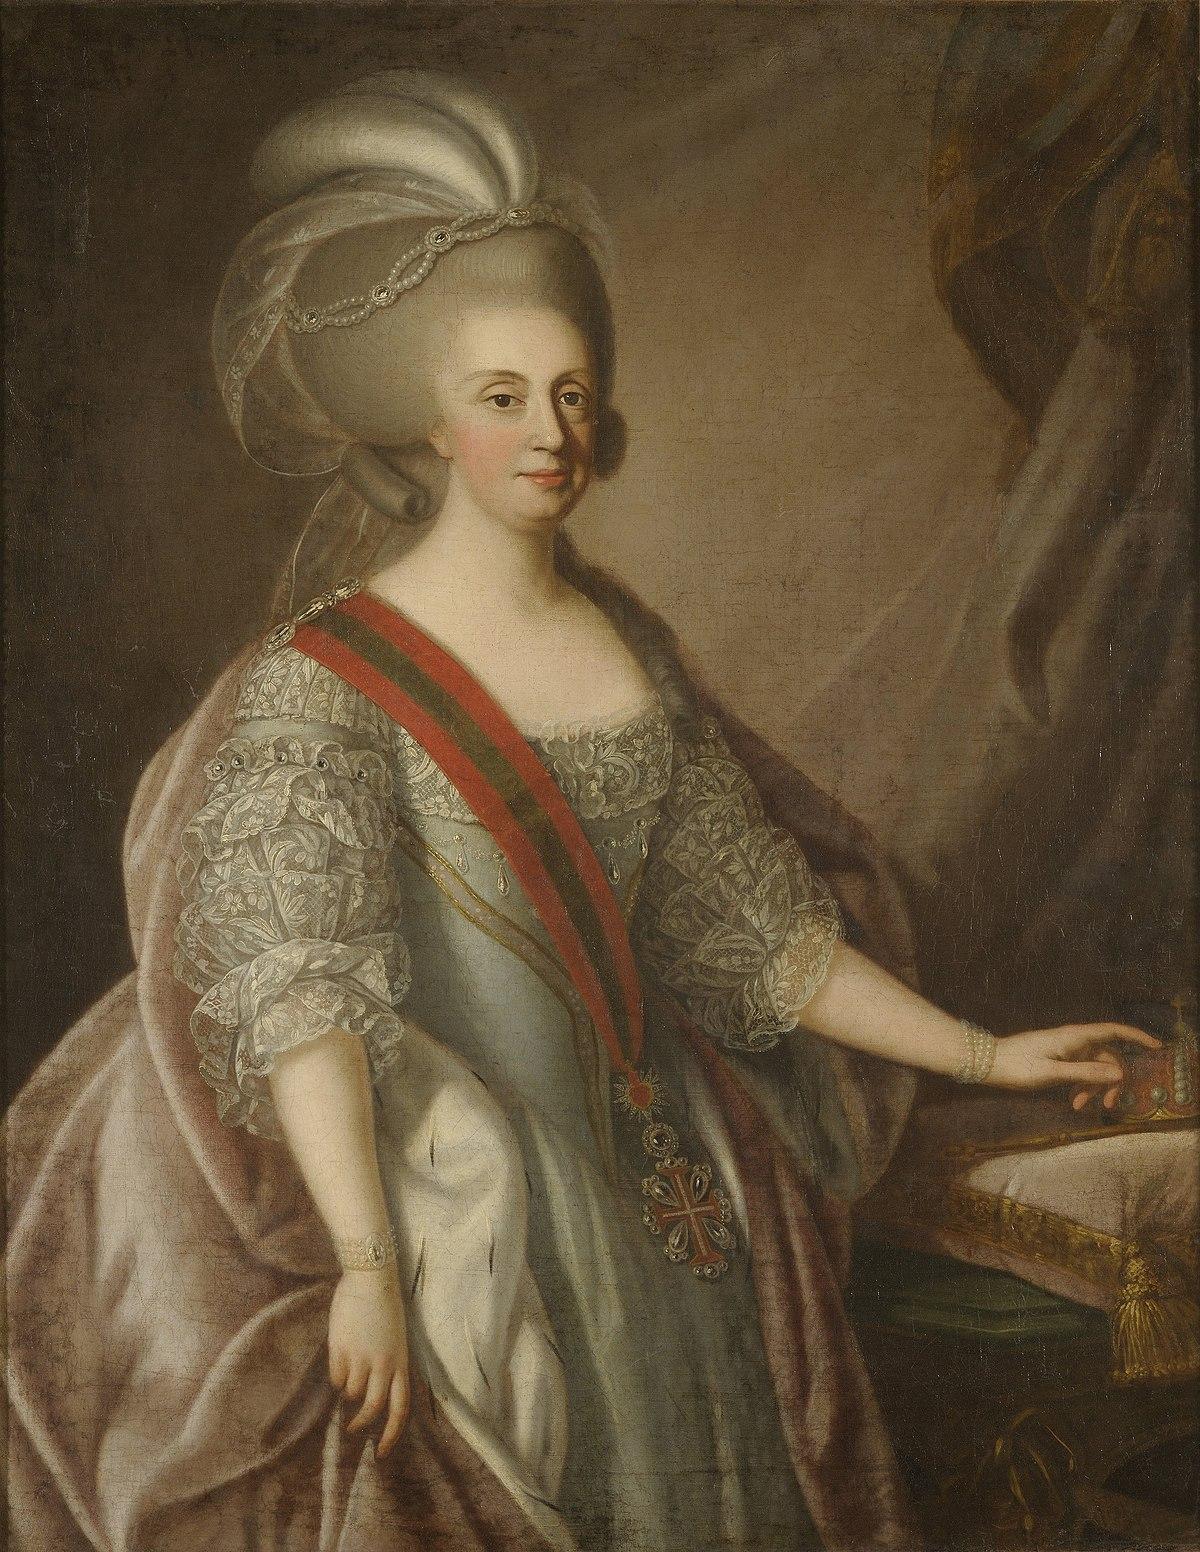 Maria I, Queen of Portugal - Giuseppe Troni, atribuído (Turim, 1739-Lisboa, 1810) - Google Cultural Institute.jpg